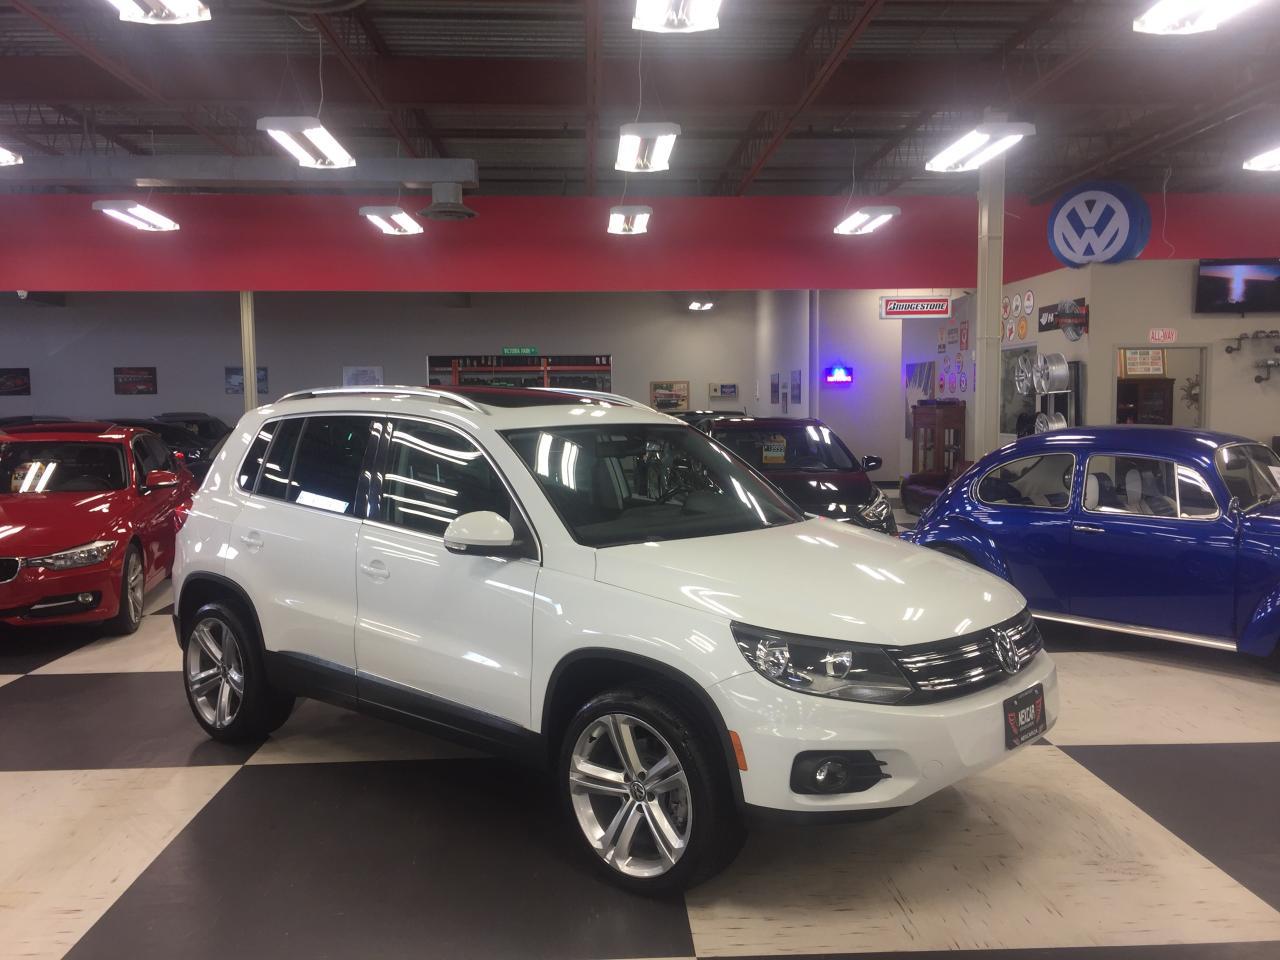 2014 Volkswagen Tiguan 2.0TSI HIGHLINE AUT0 AWD NAVI LEATHER PANO/ROOF